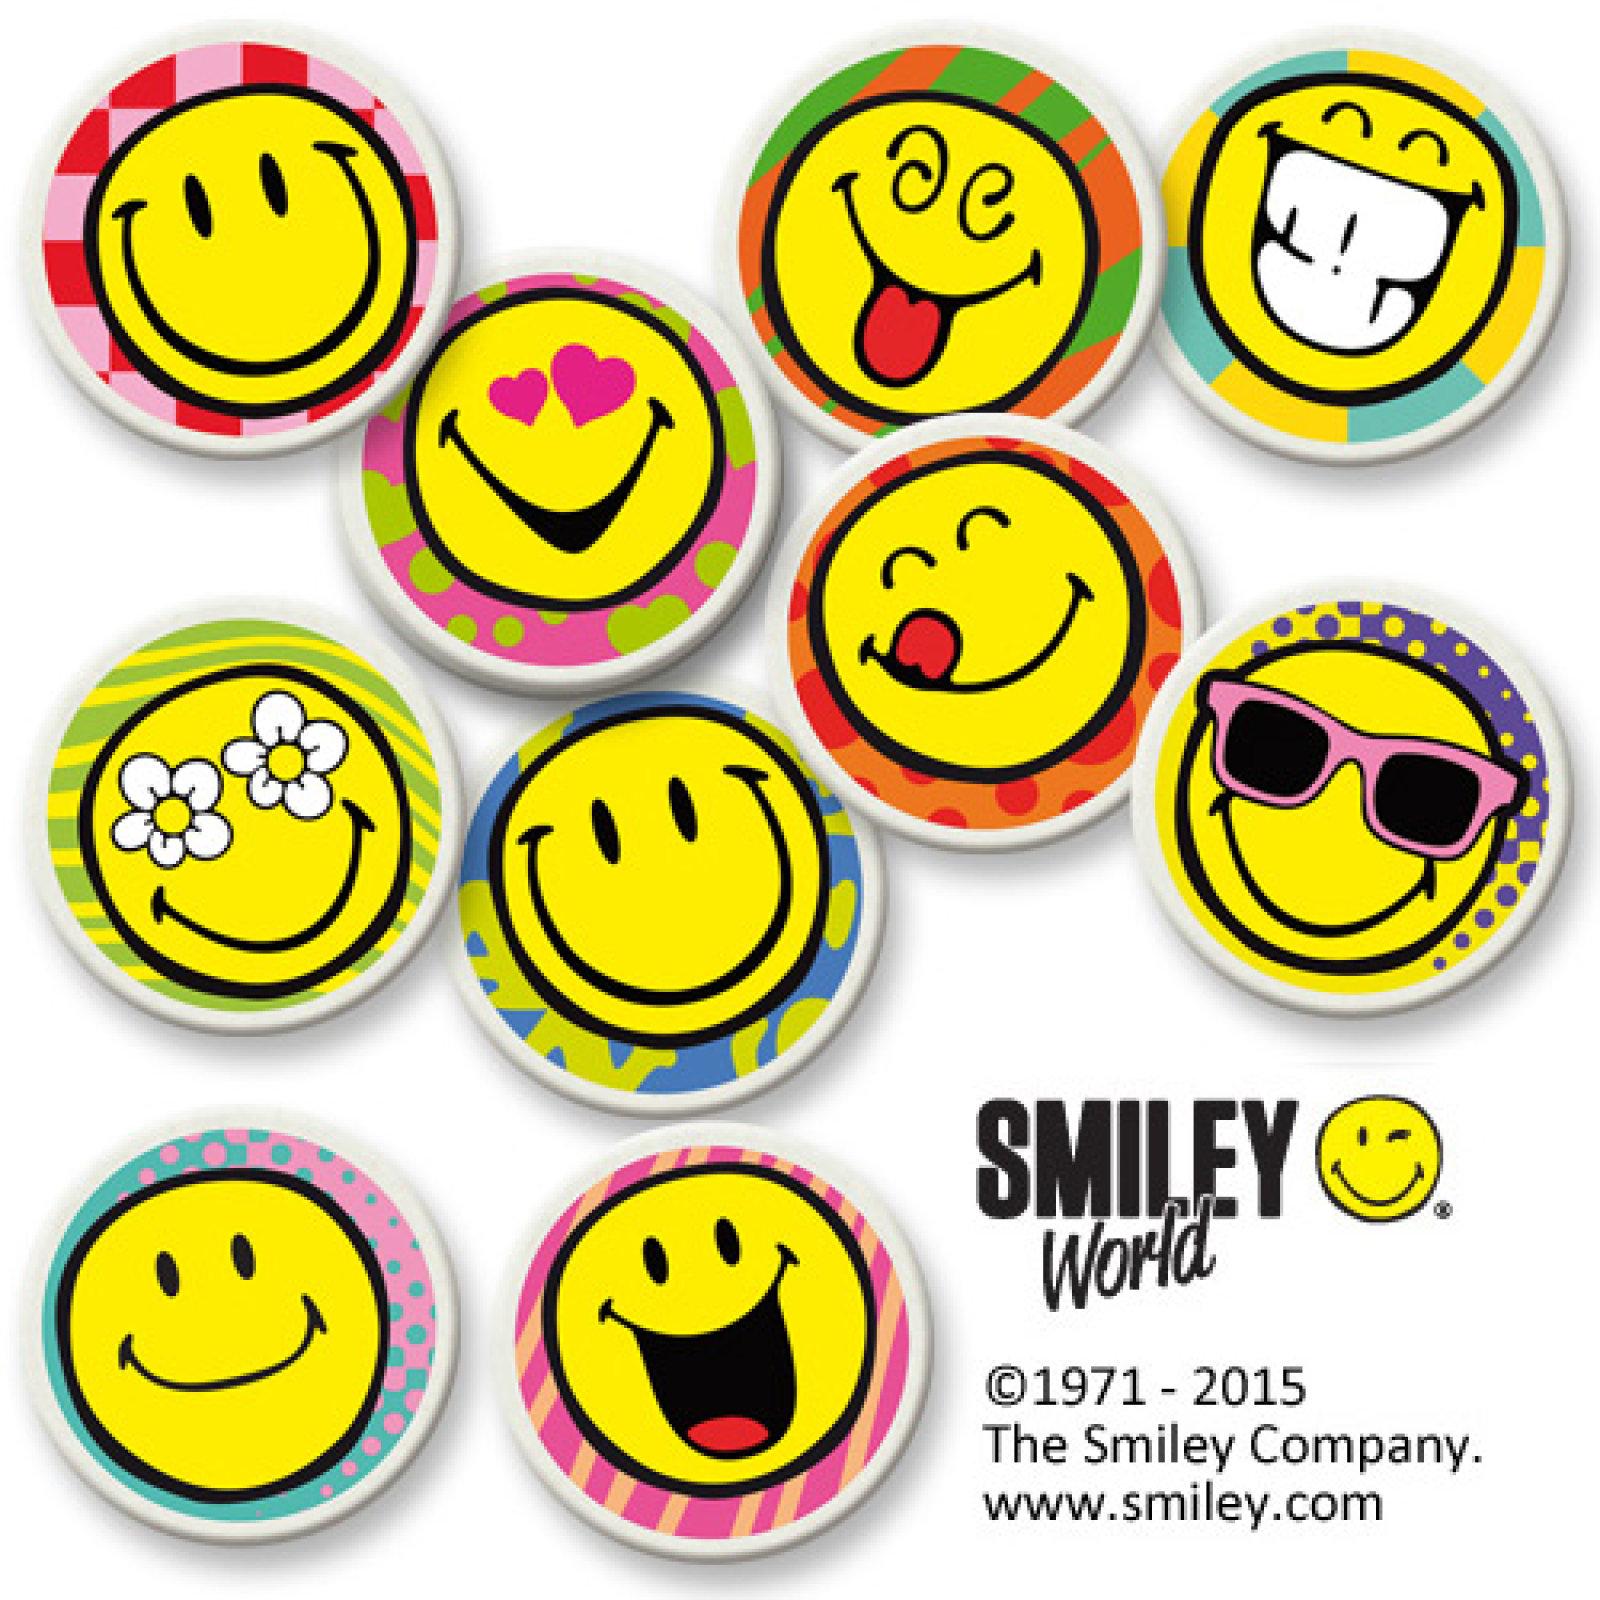 Dekorschilder - Smiley | der-ideen-shop.de